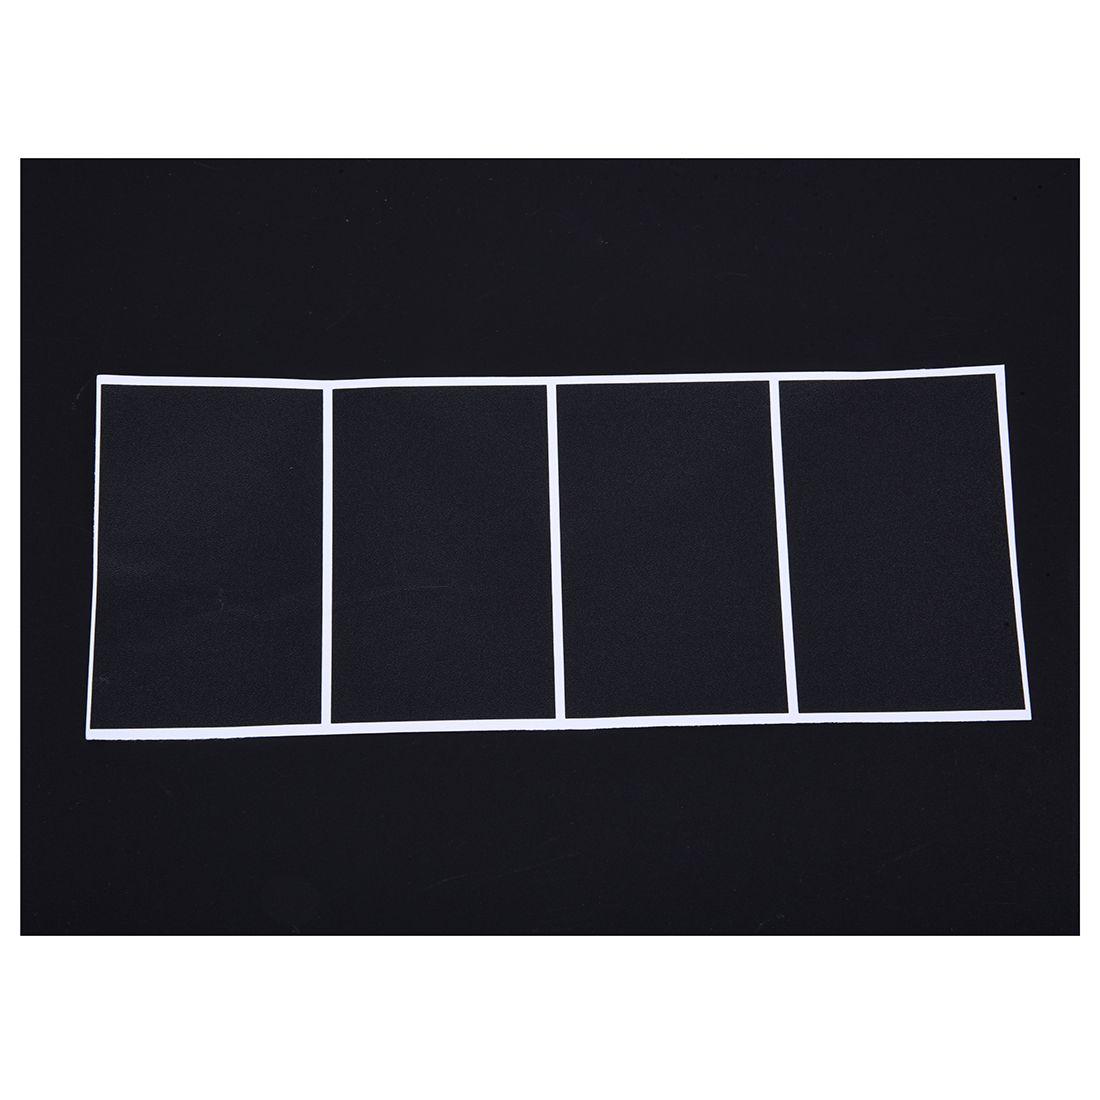 24x tafel aufkleber bezeichnung fuer kuechen kanister nette wand aufklebe l o5l7 ebay. Black Bedroom Furniture Sets. Home Design Ideas